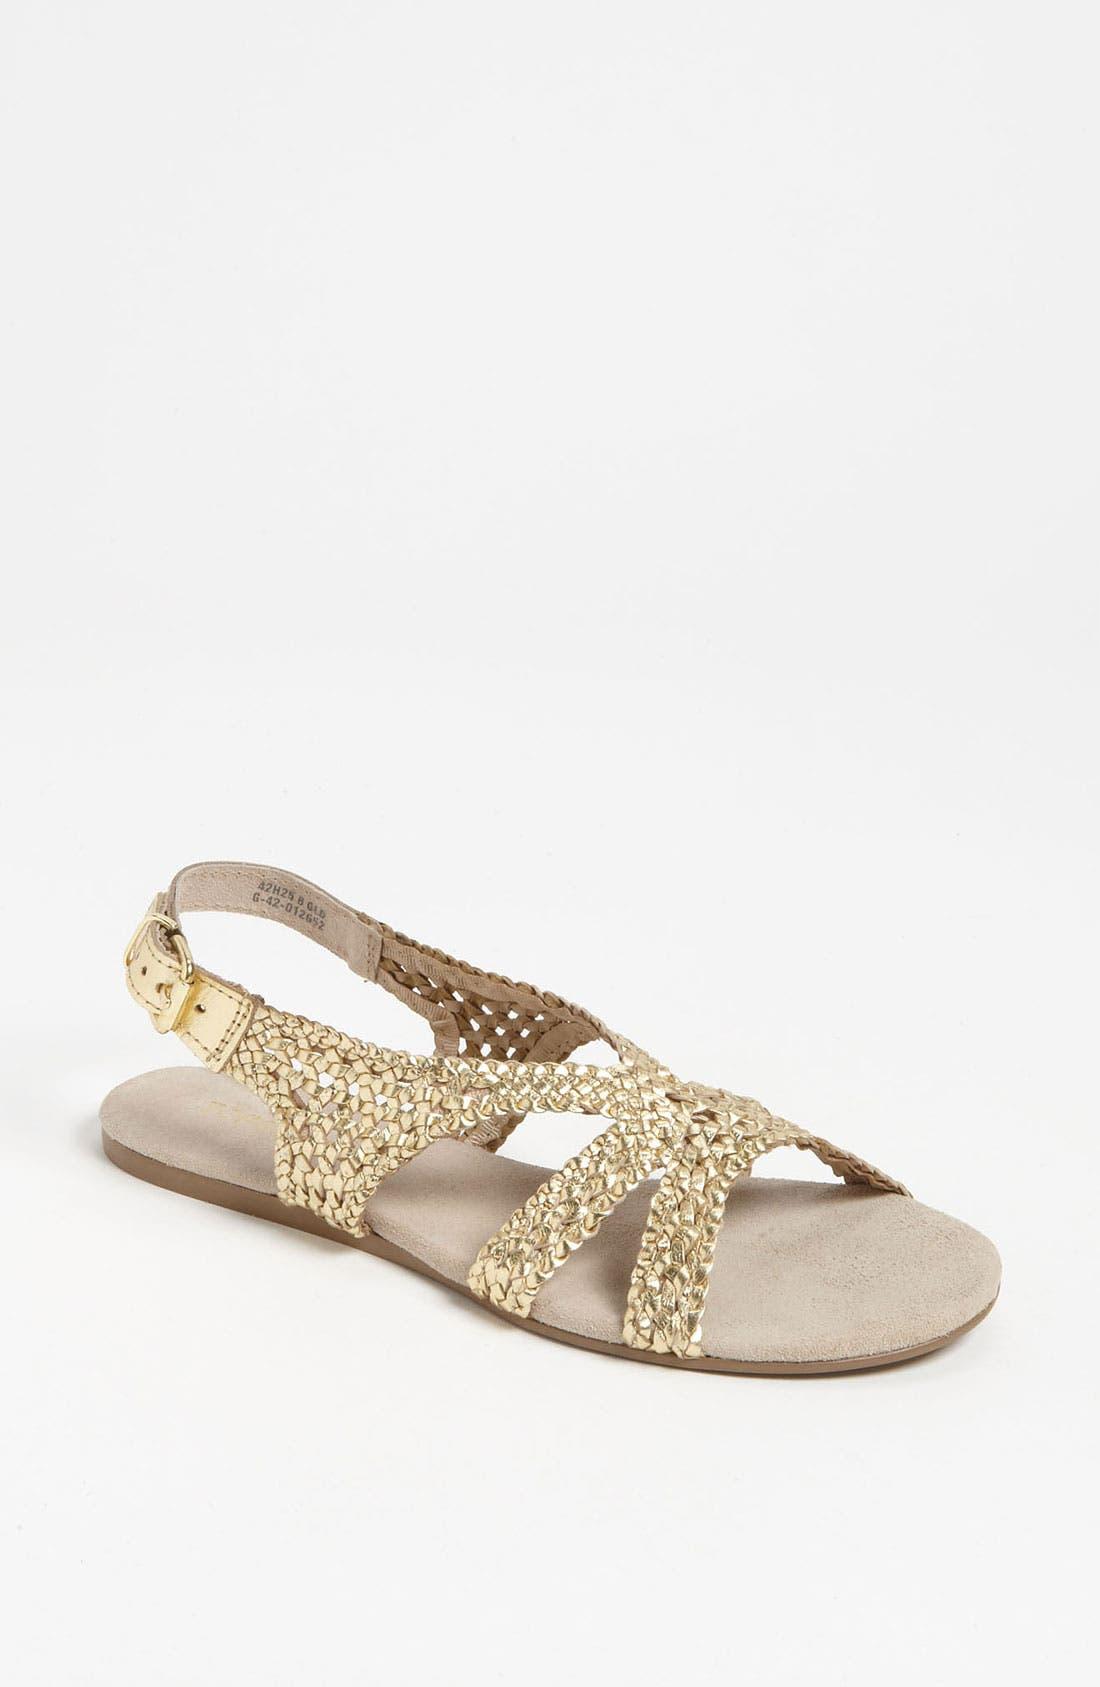 Main Image - Topshop 'Hinders' Woven Sandal